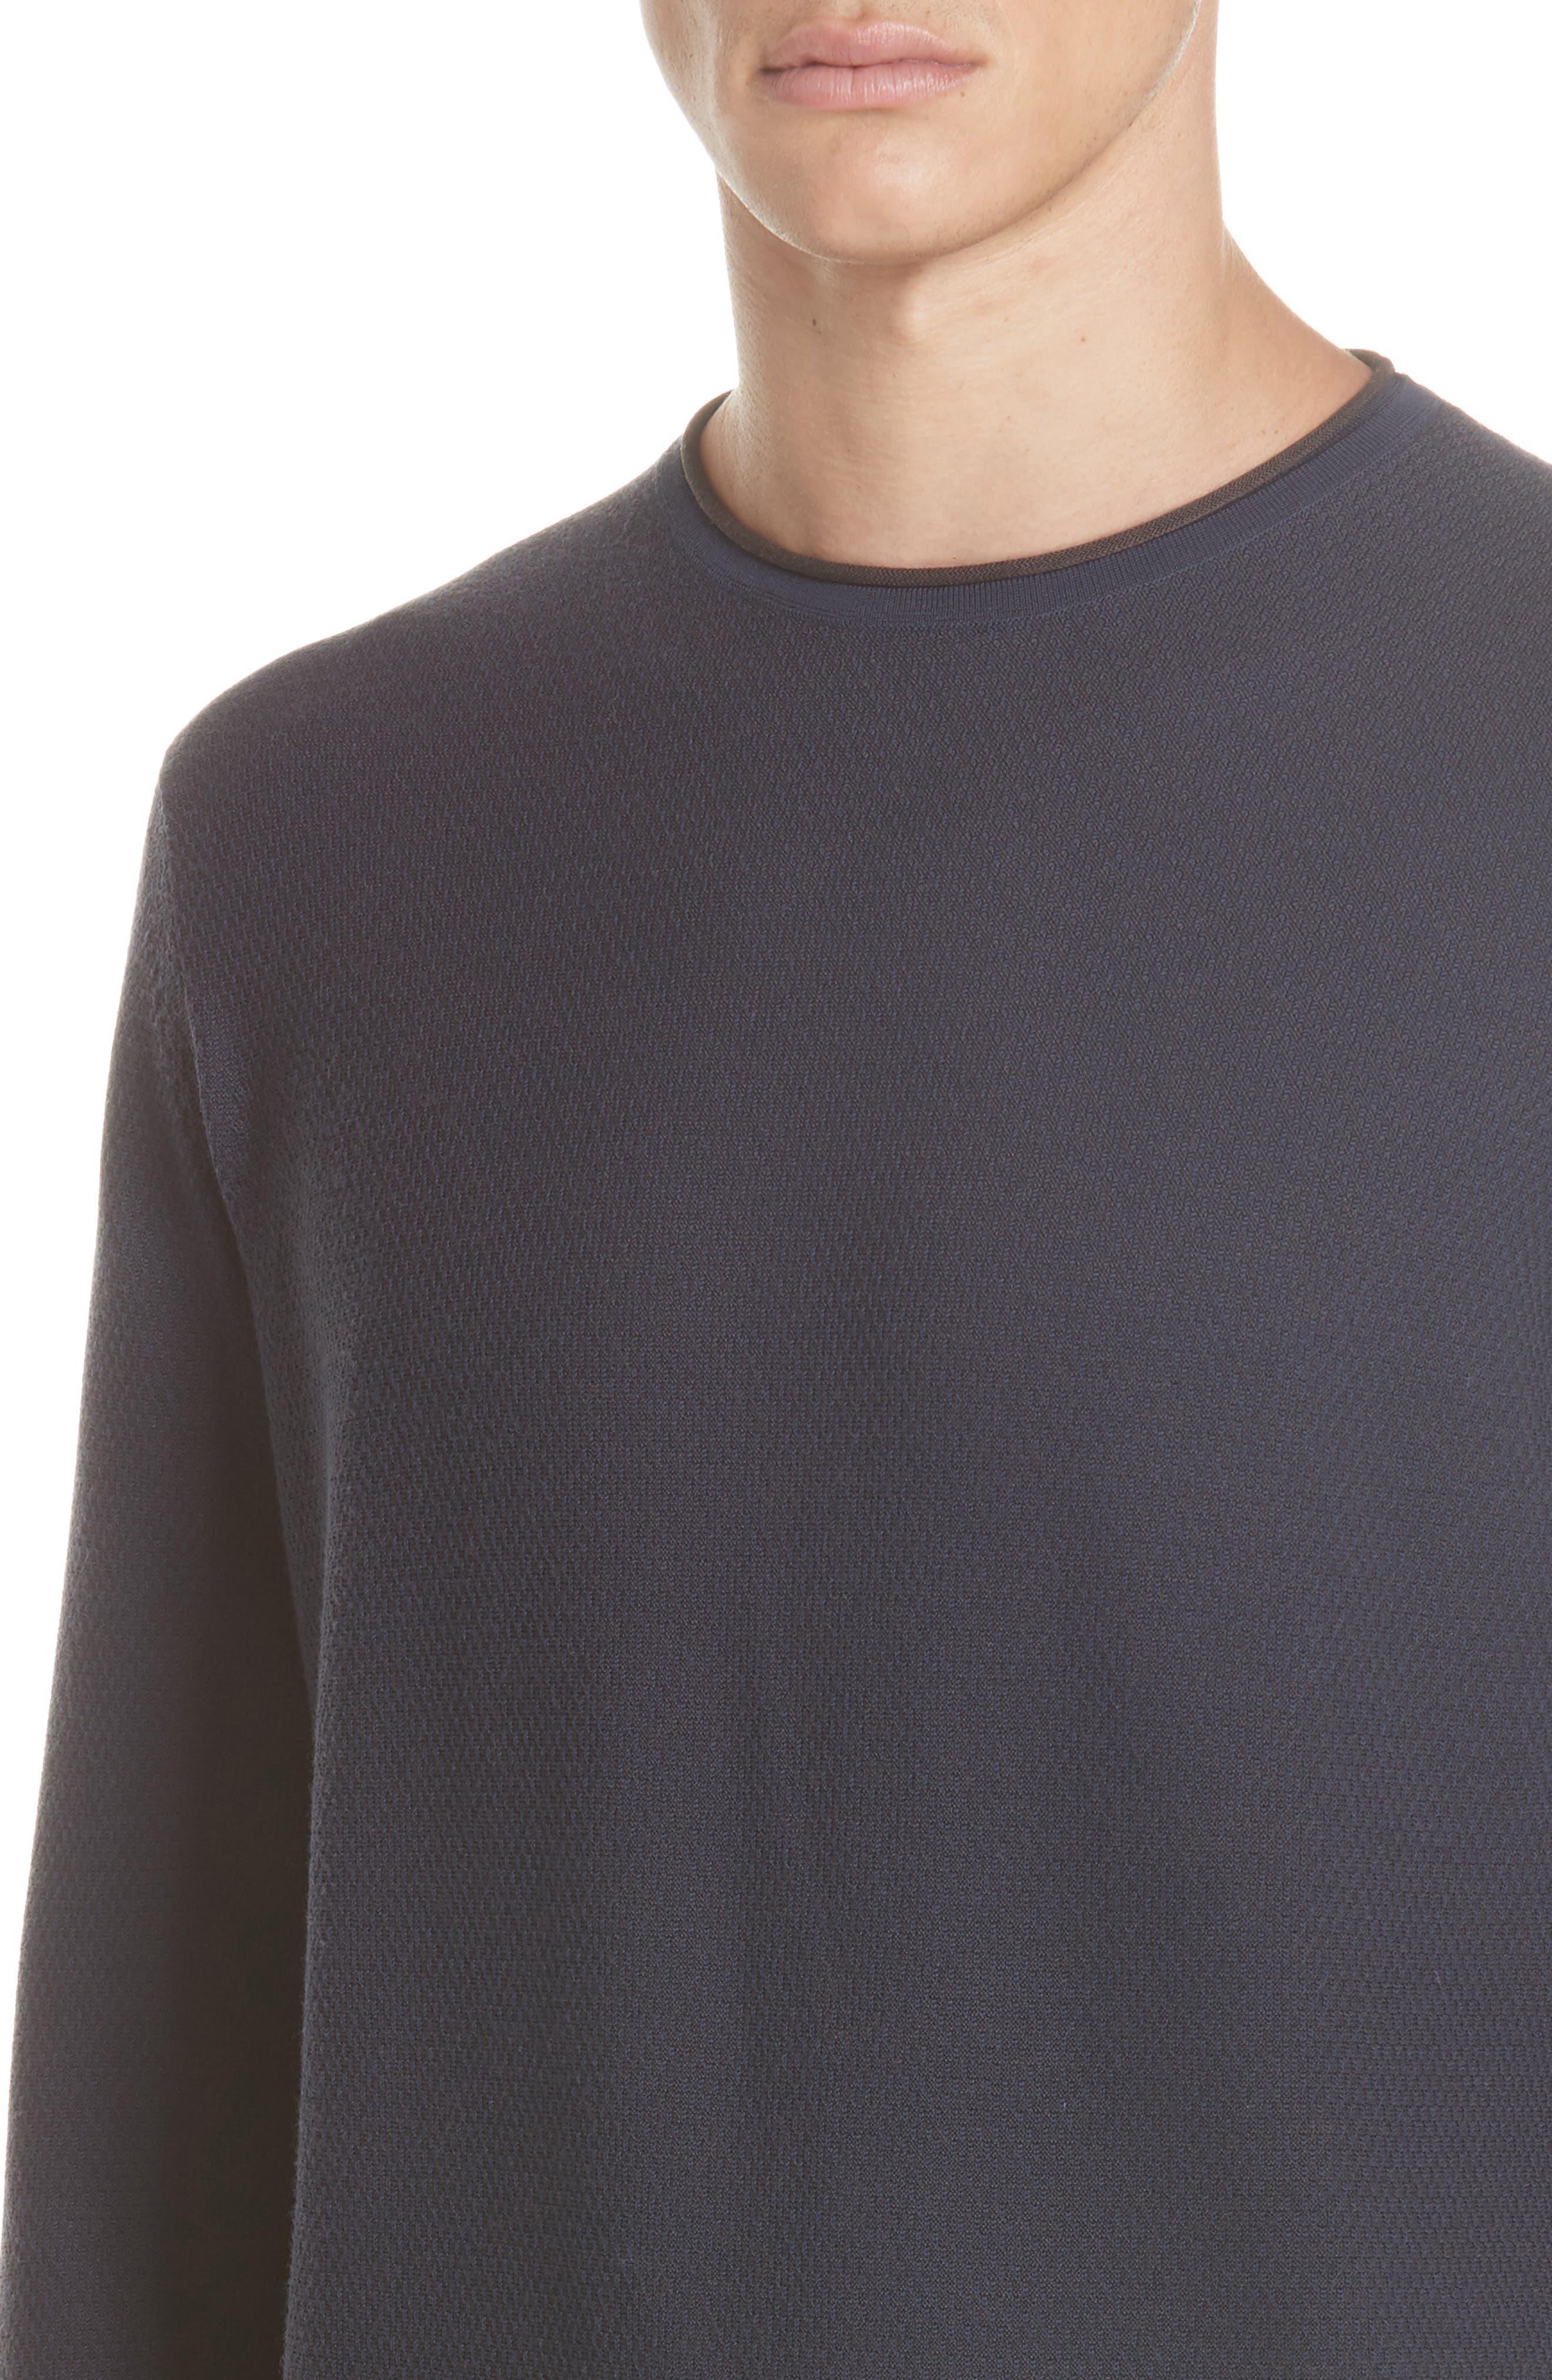 Crewneck Wool Sweater,                             Alternate thumbnail 4, color,                             NAVY